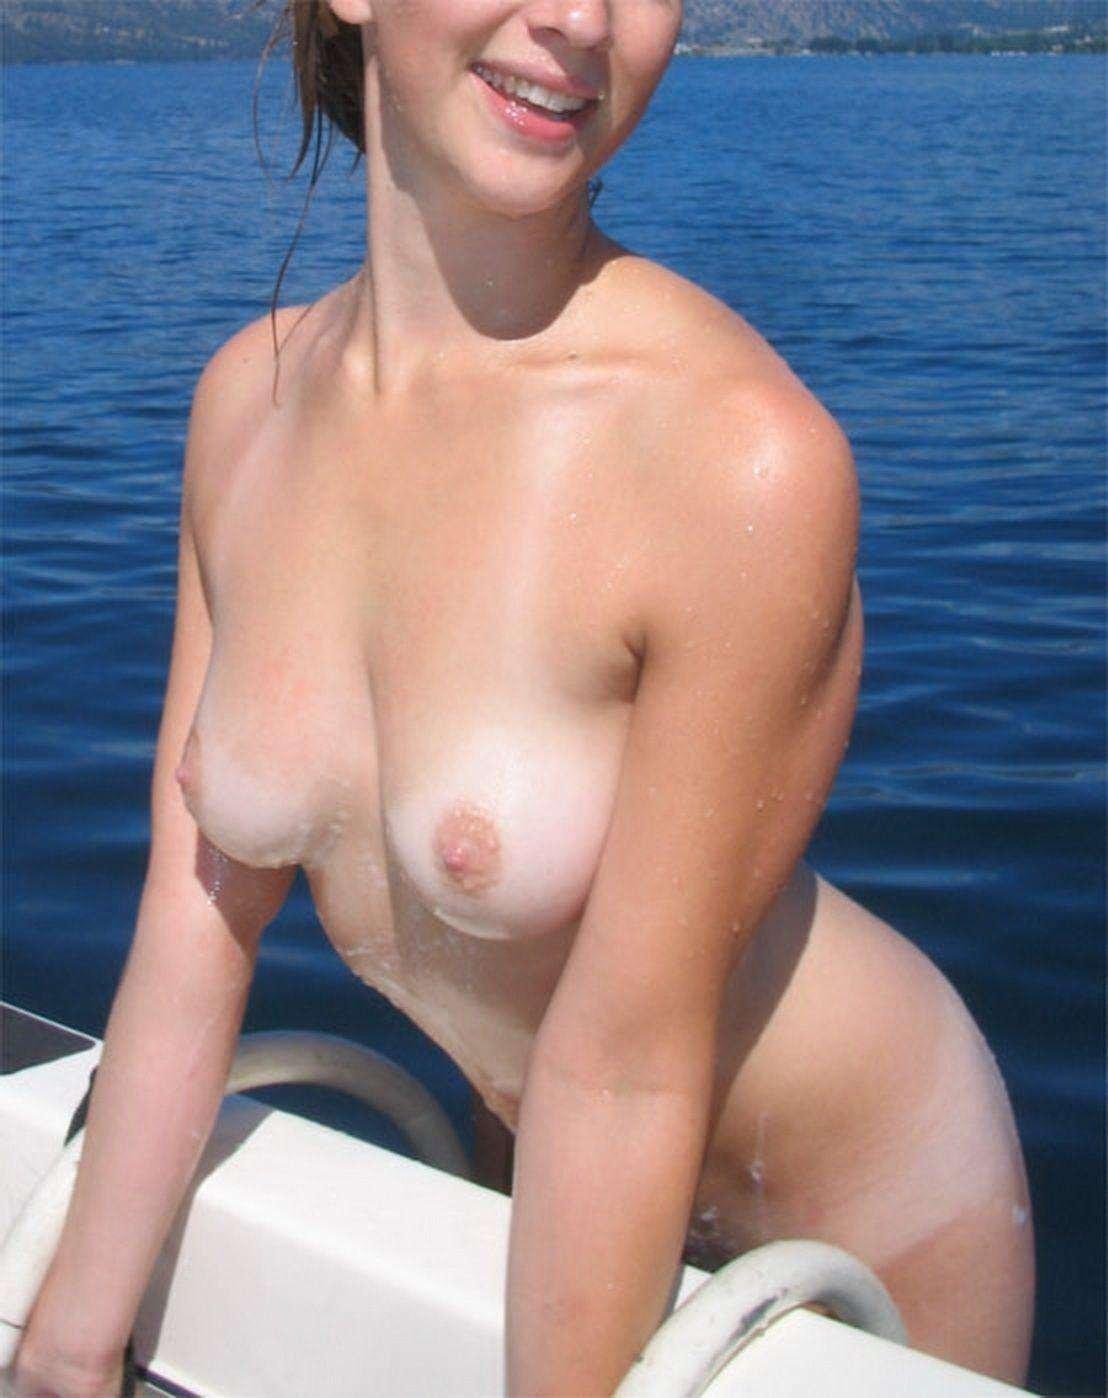 За прогулку на яхте худая шлюшка согласна на все что угодно